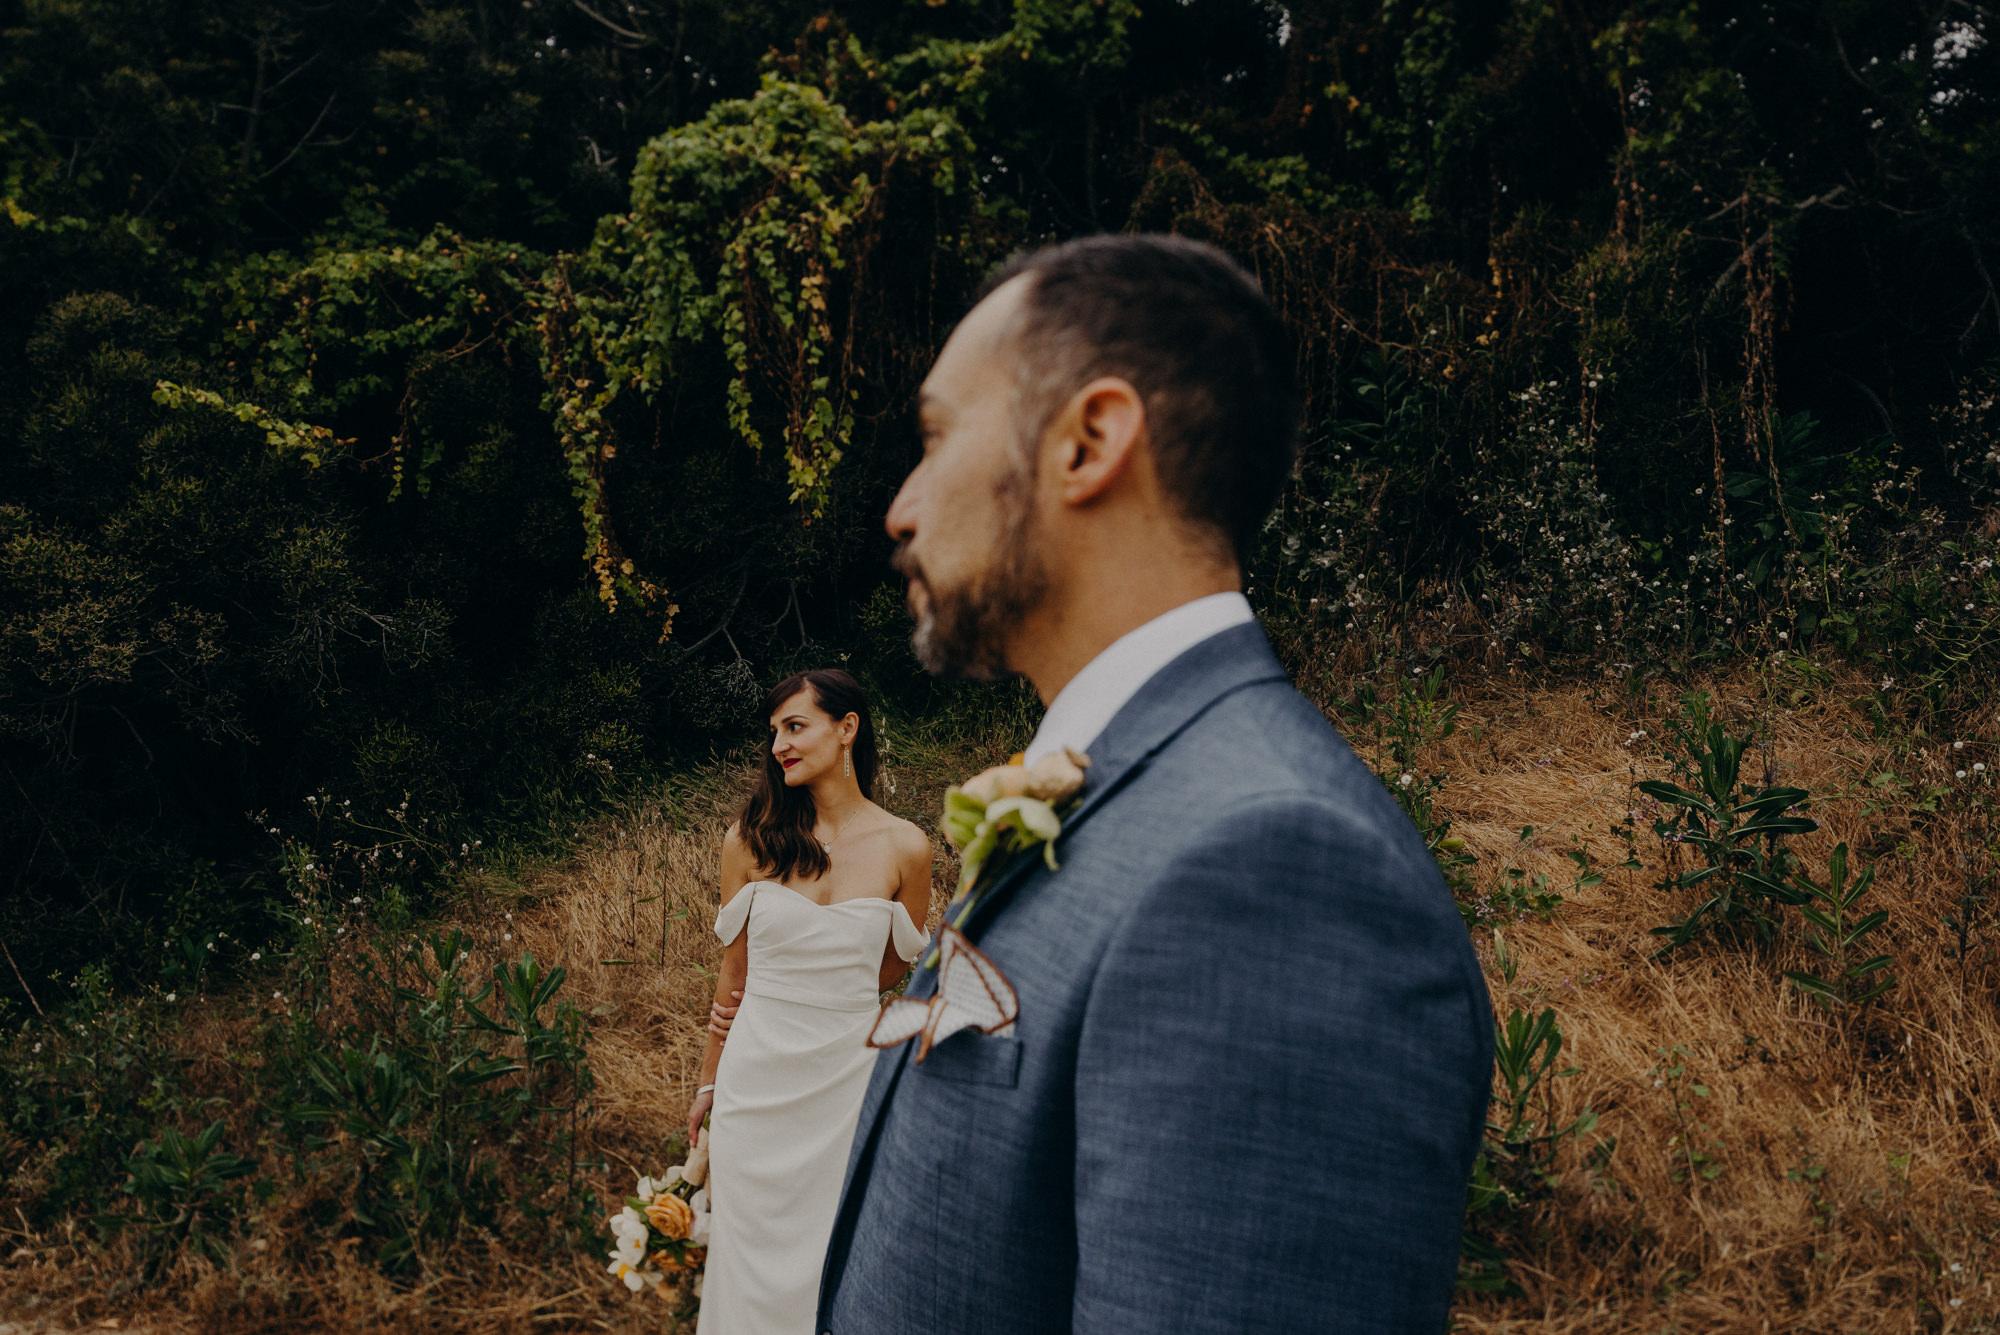 elopement photographer in los angeles - la wedding photographer - isaiahandtaylor.com-034.jpg